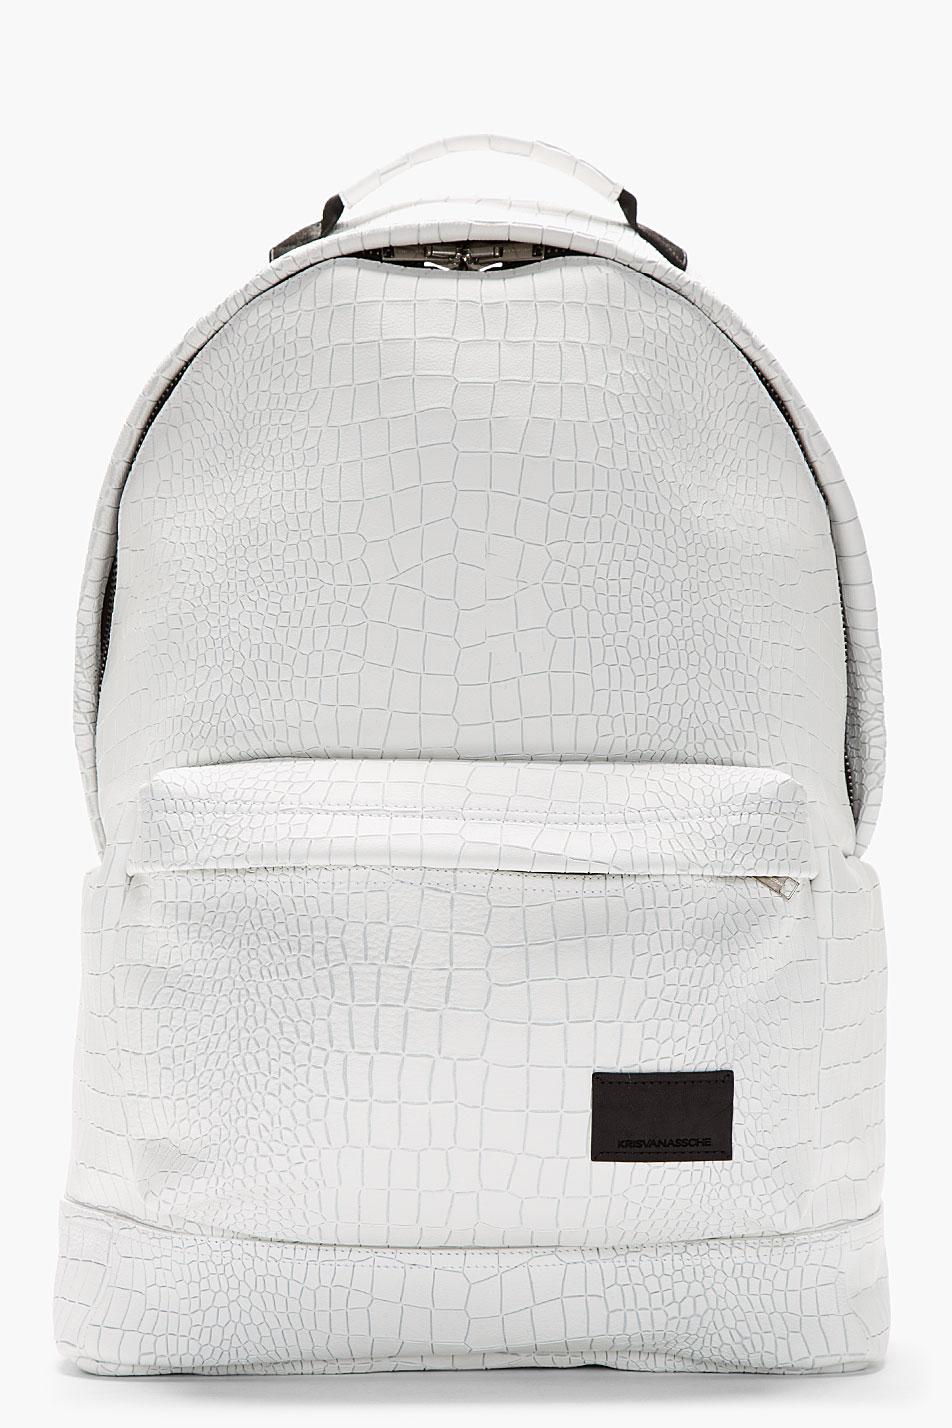 Lyst Kris Van Assche White Etched Croc Pattern Backpack